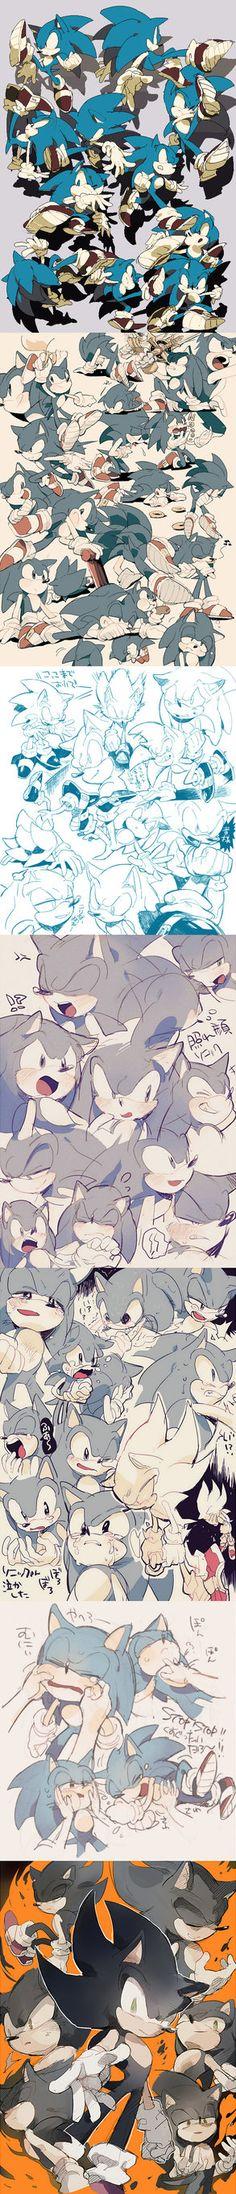 """Sonic sketch"" by aoki6311"